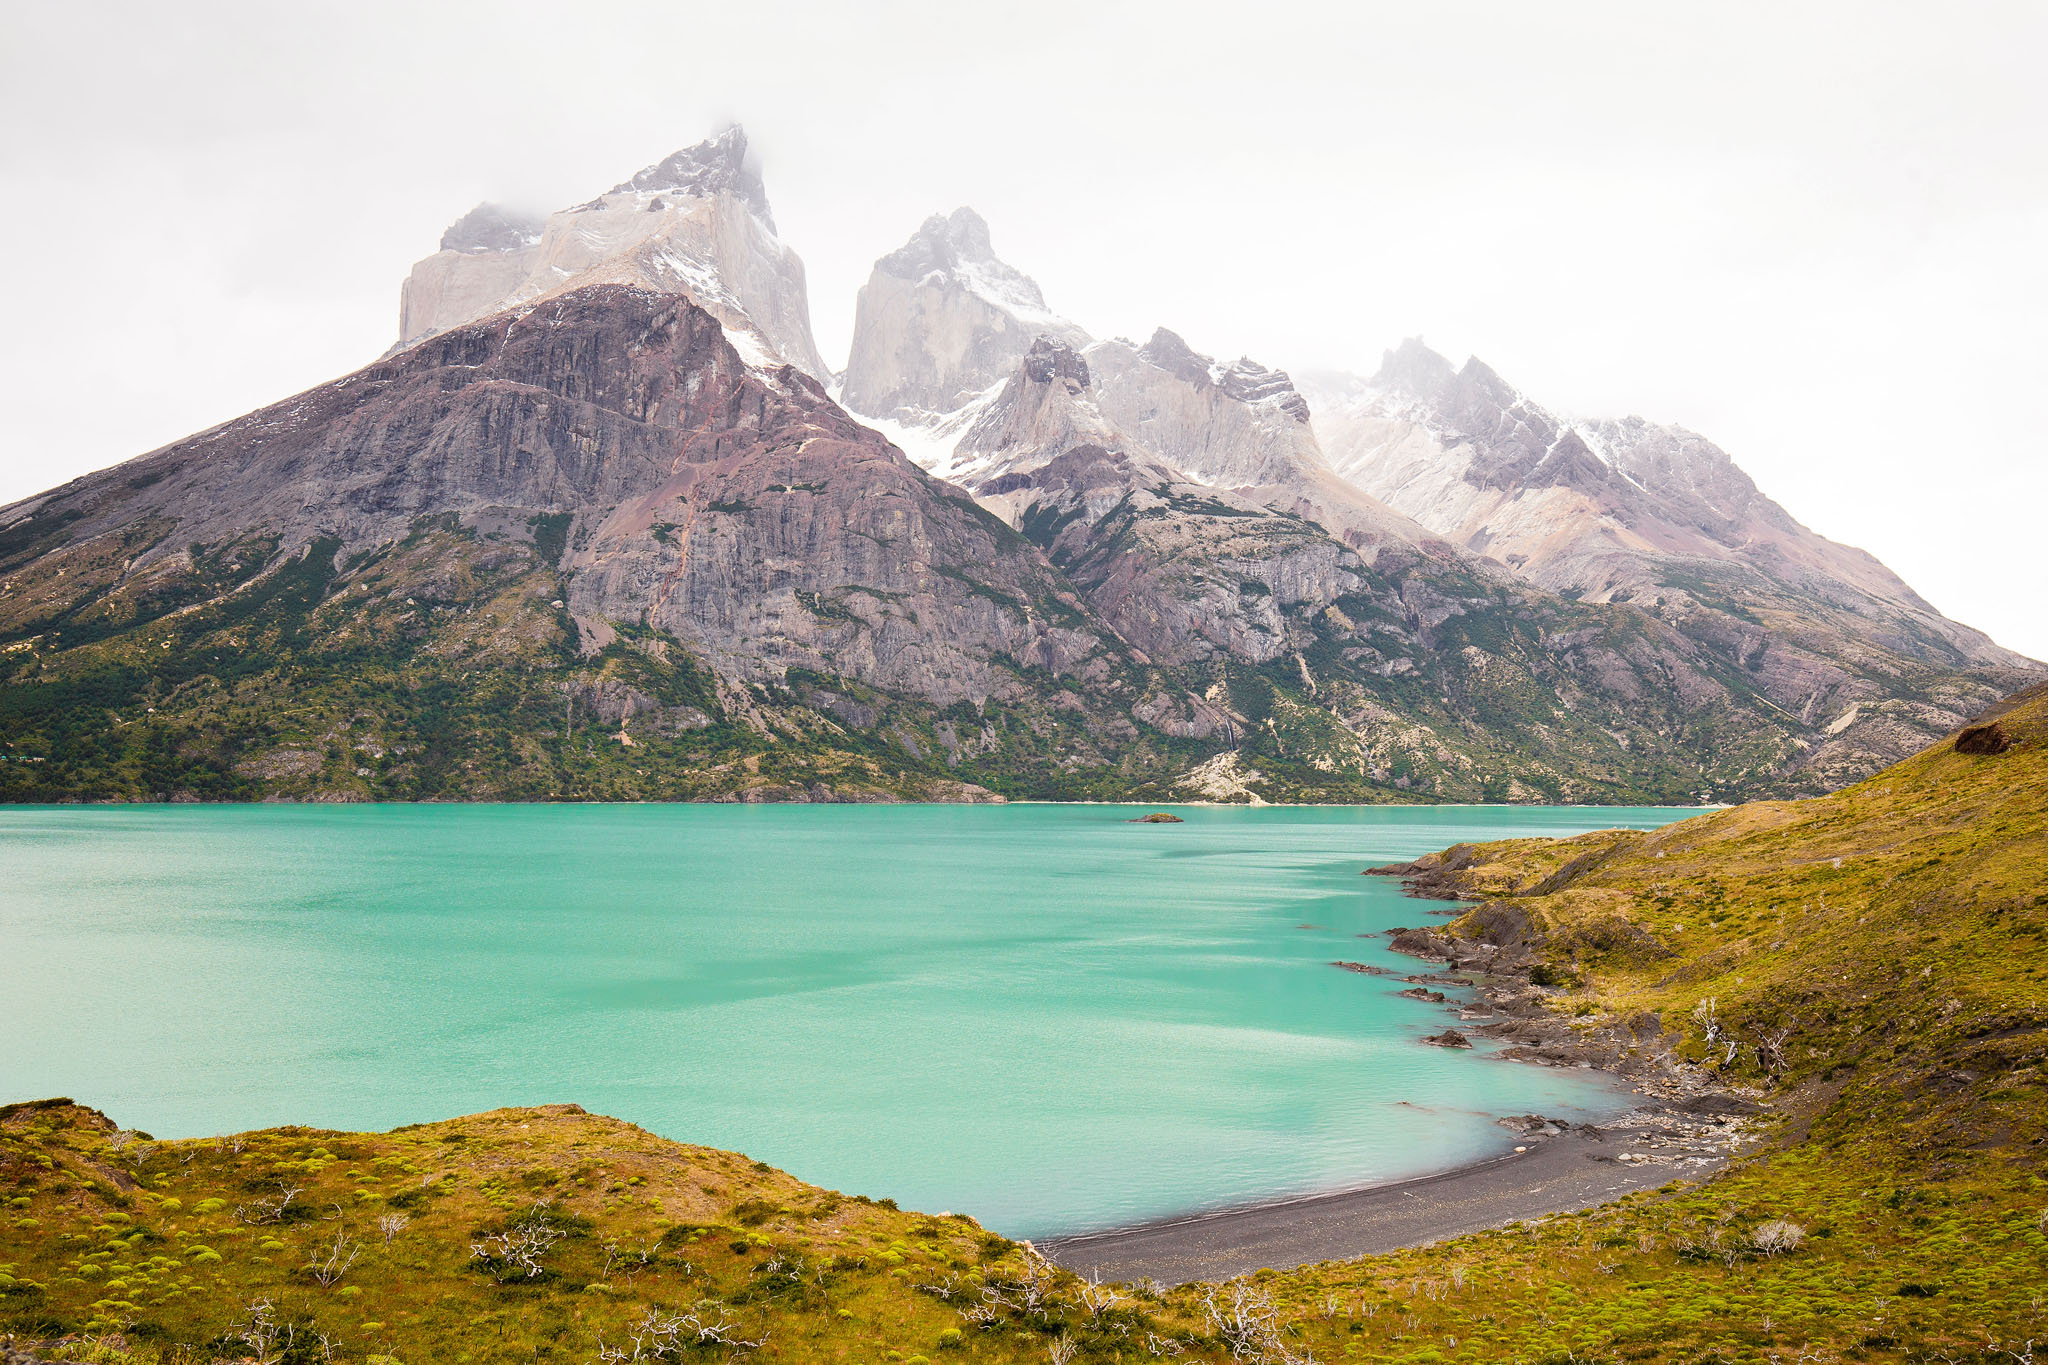 Wedding-Travellers-Overlanding-Destination-Wedding-Chile-Torres-del-Paine-turquoise-cuernos-lago-lake-nordenskjold